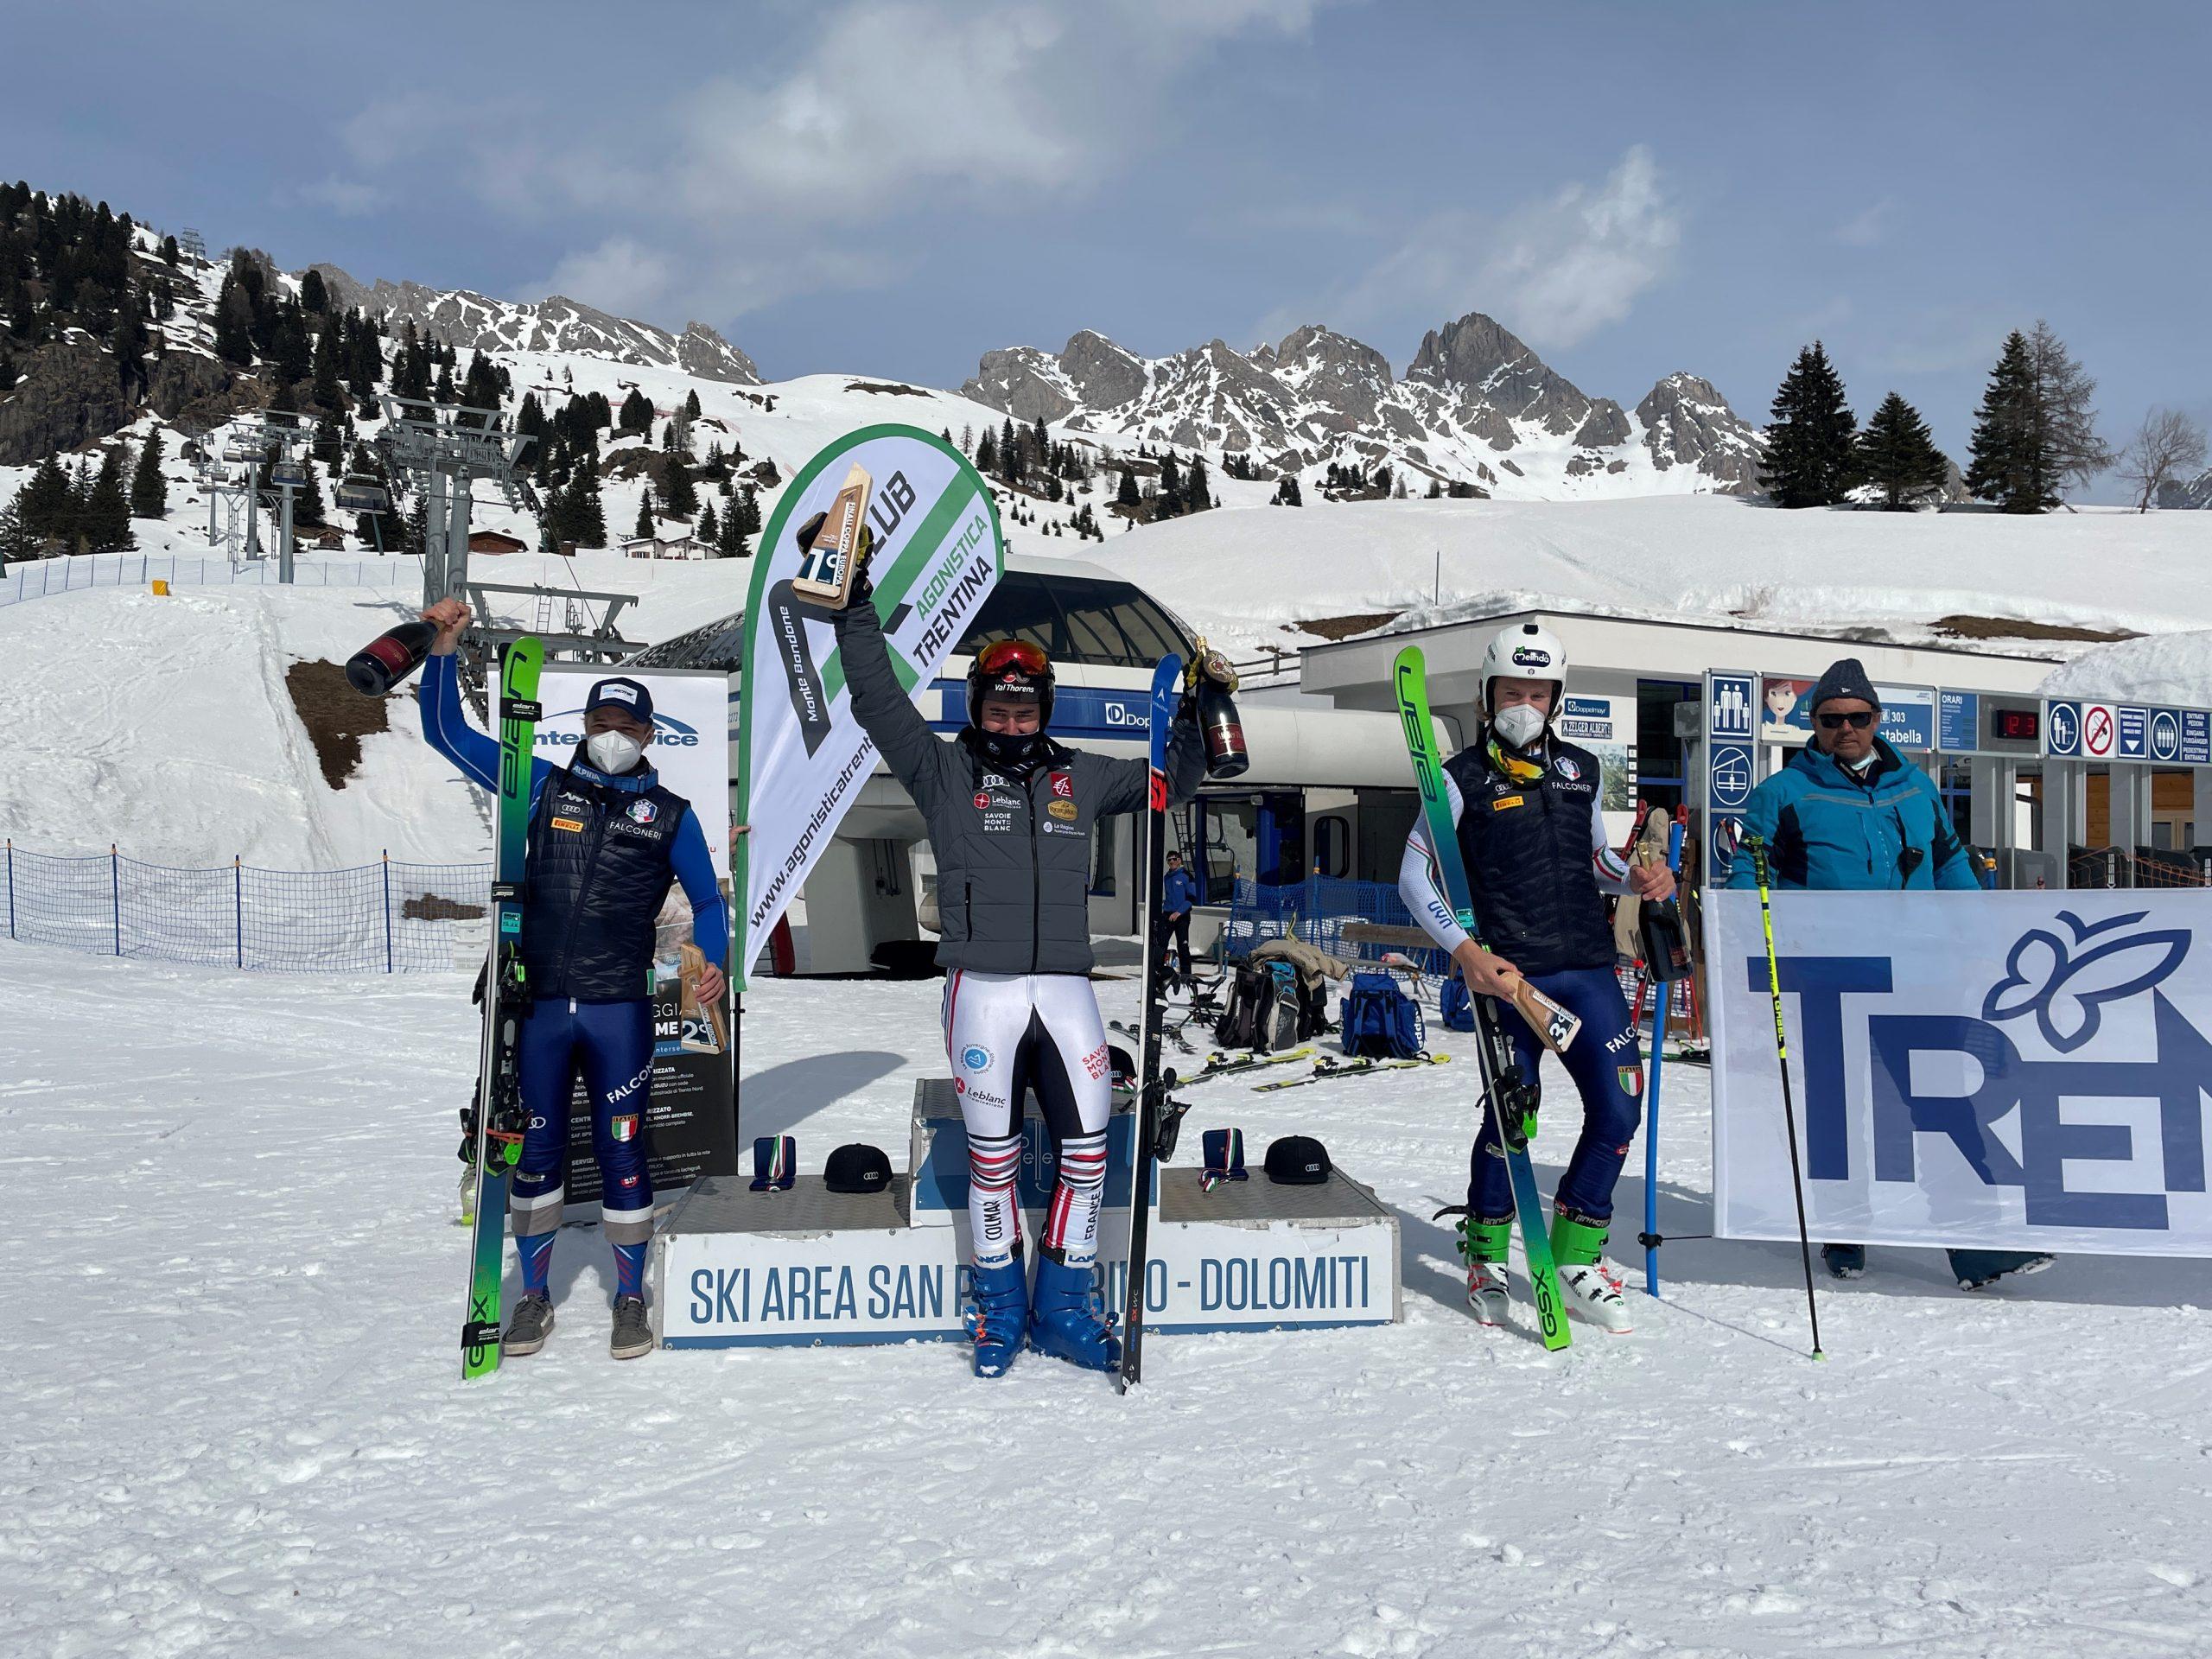 Lumière sur Romain MARI, athlète de skicross